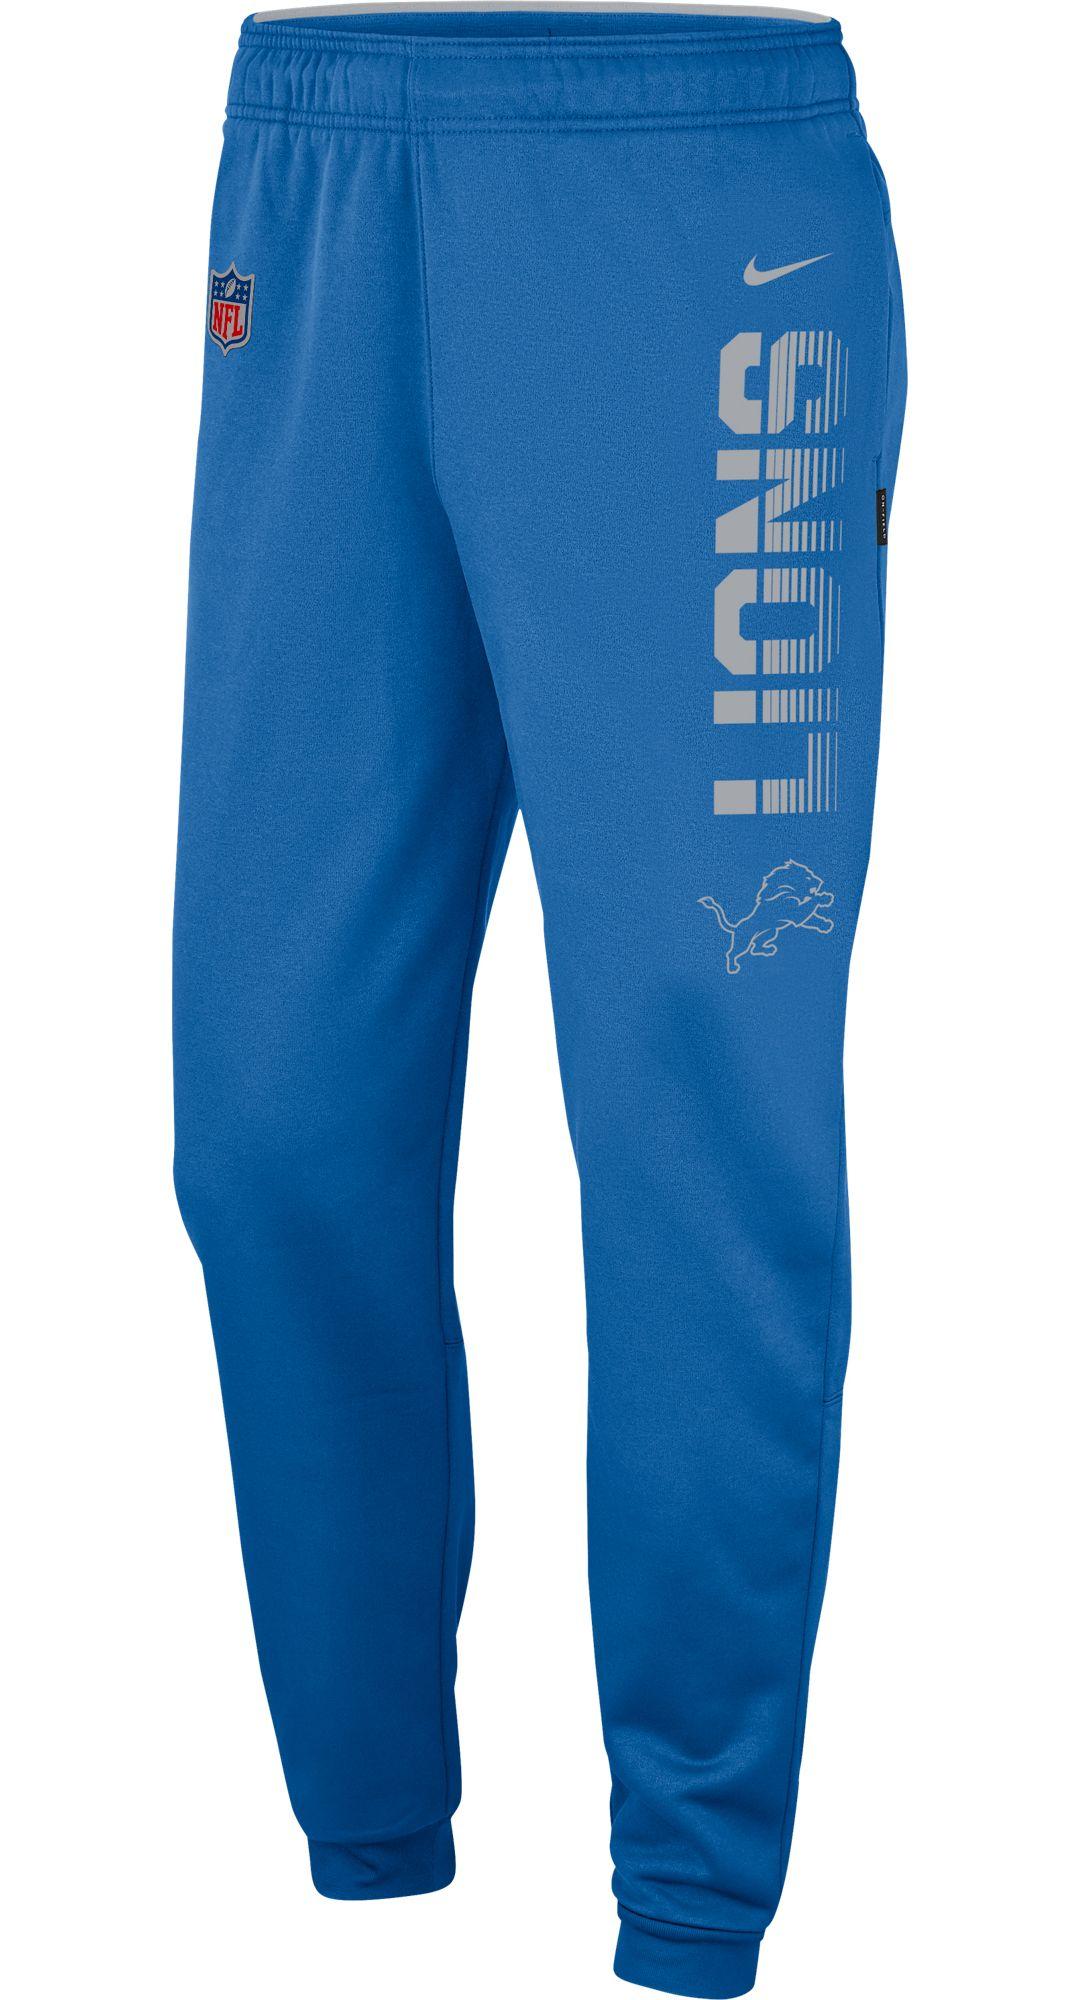 16170a23 Nike Men's Detroit Lions Sideline Therma-FIT Performance Blue Pants